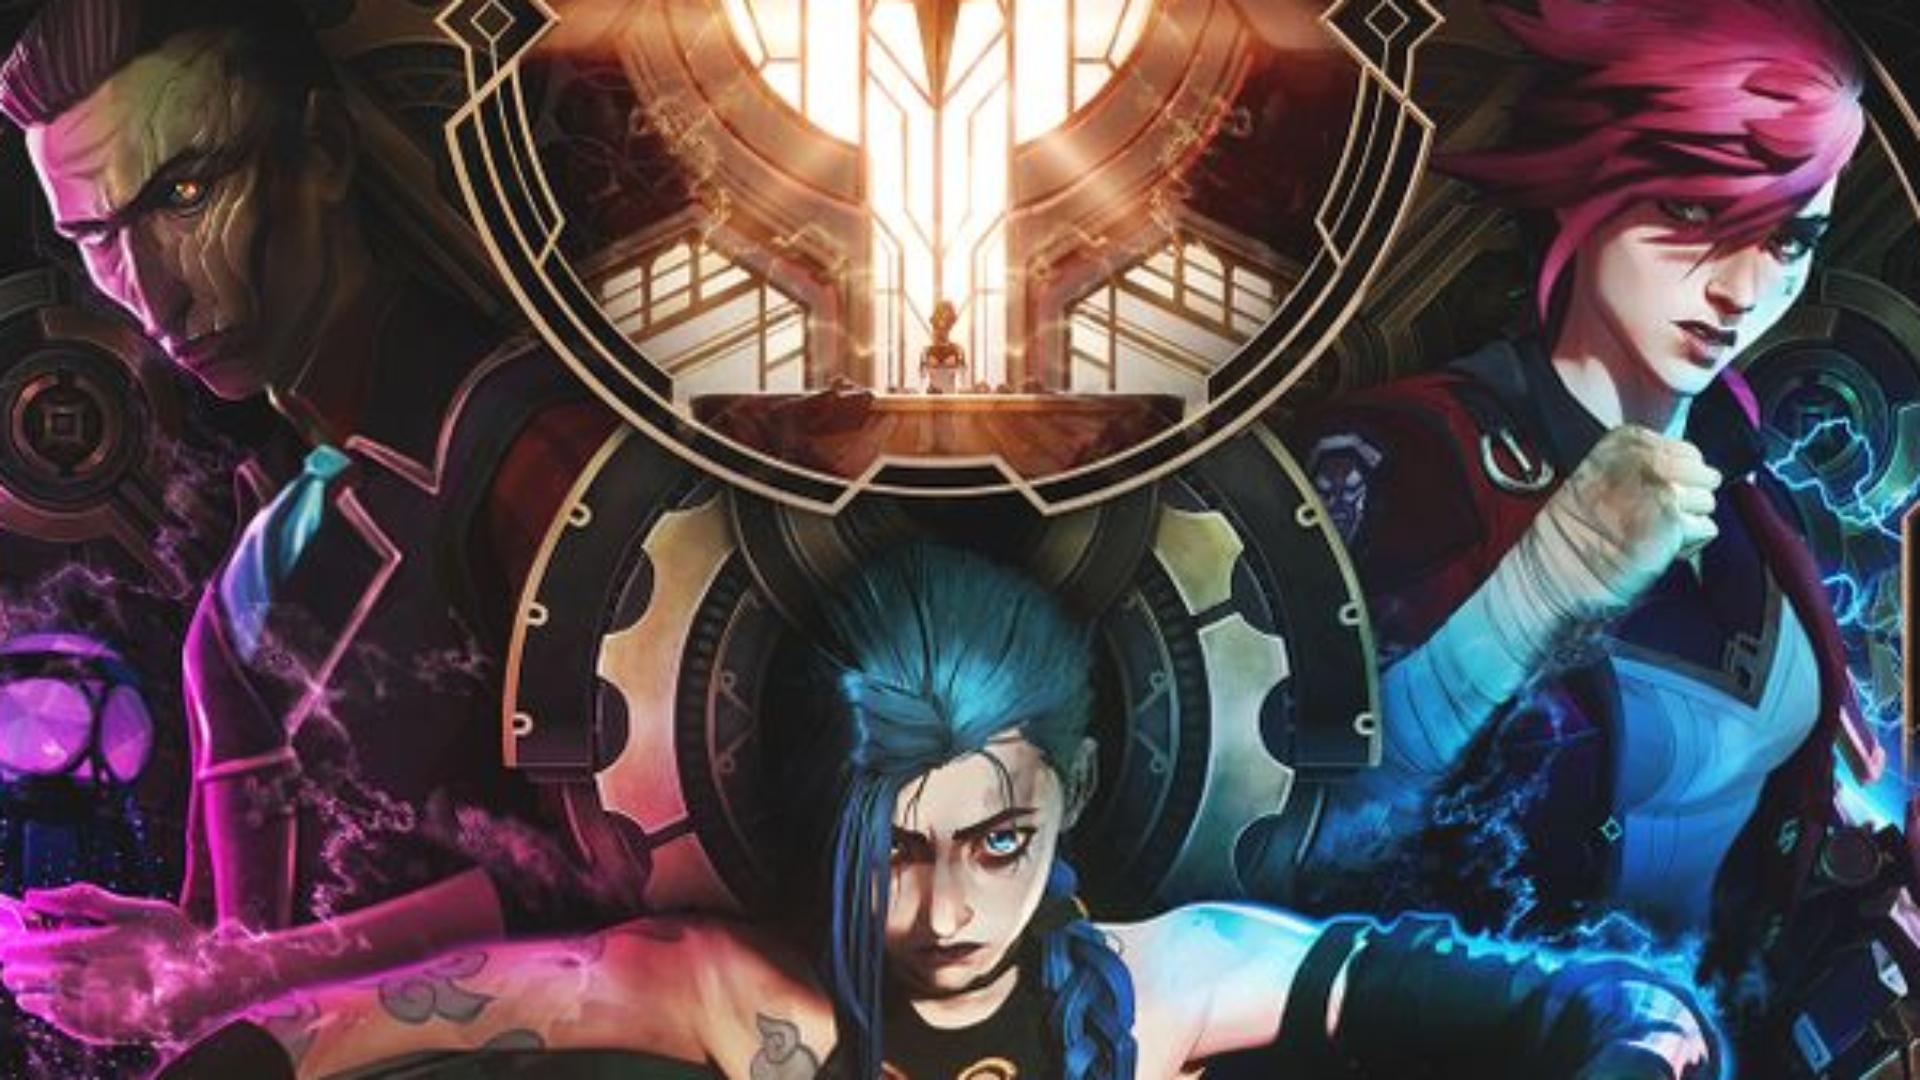 Secret-Cinema-Presents-Arcane-GamersRD (1)